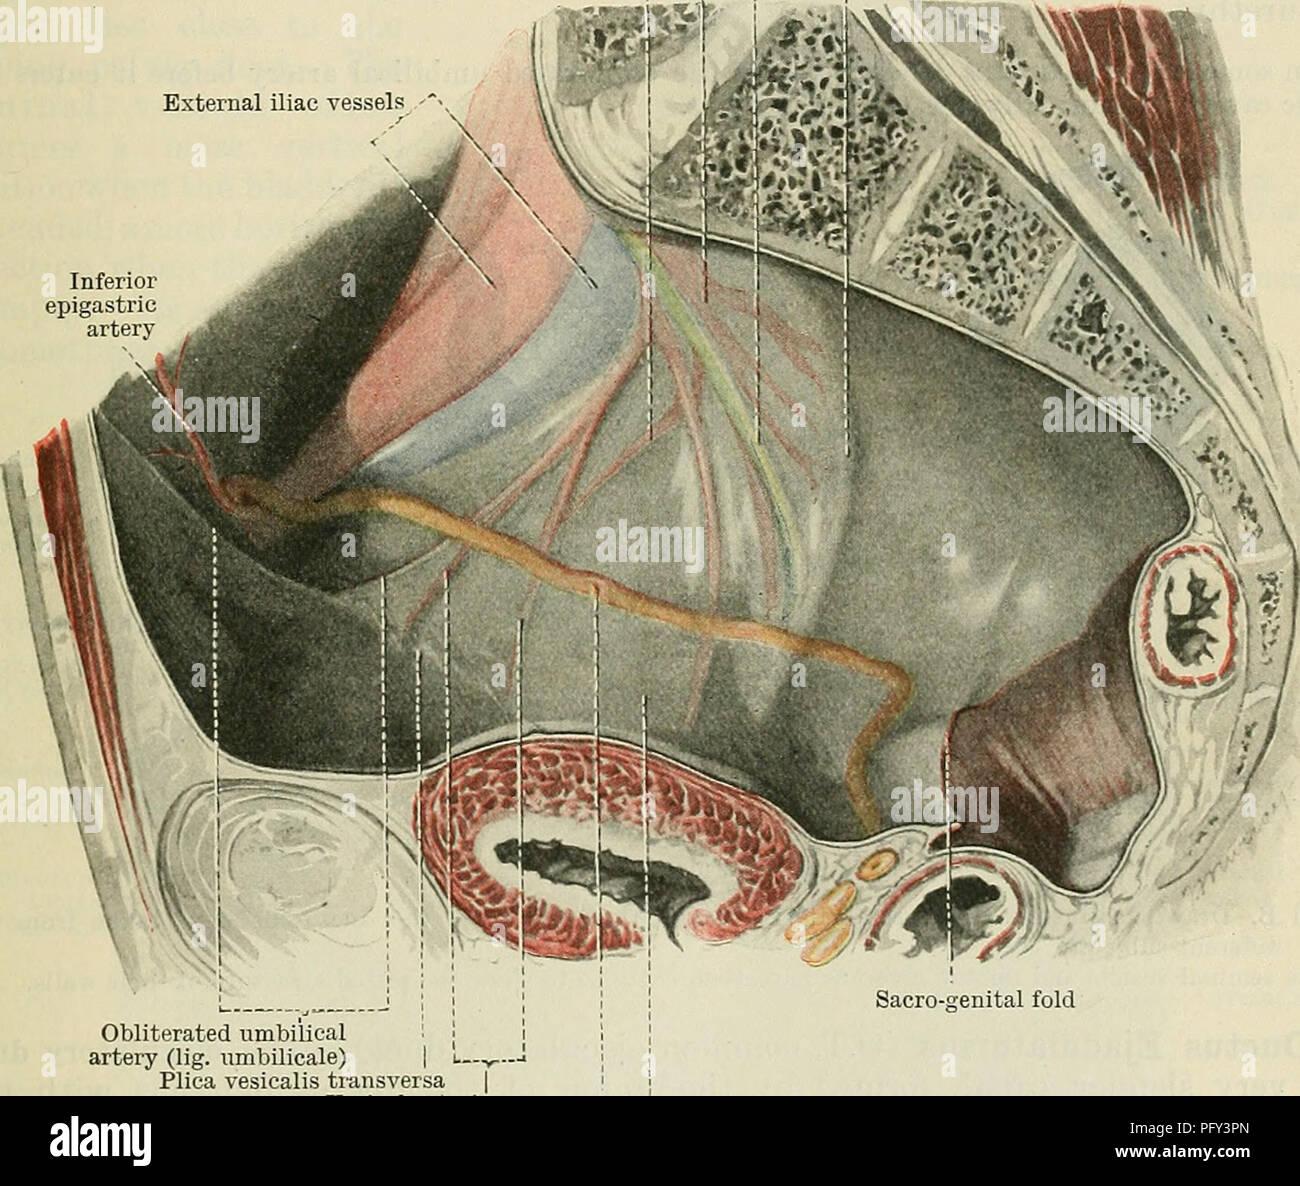 Cunninghams Lehrbuch der Anatomie. Anatomie. Die DEFEKENT KANAL ...